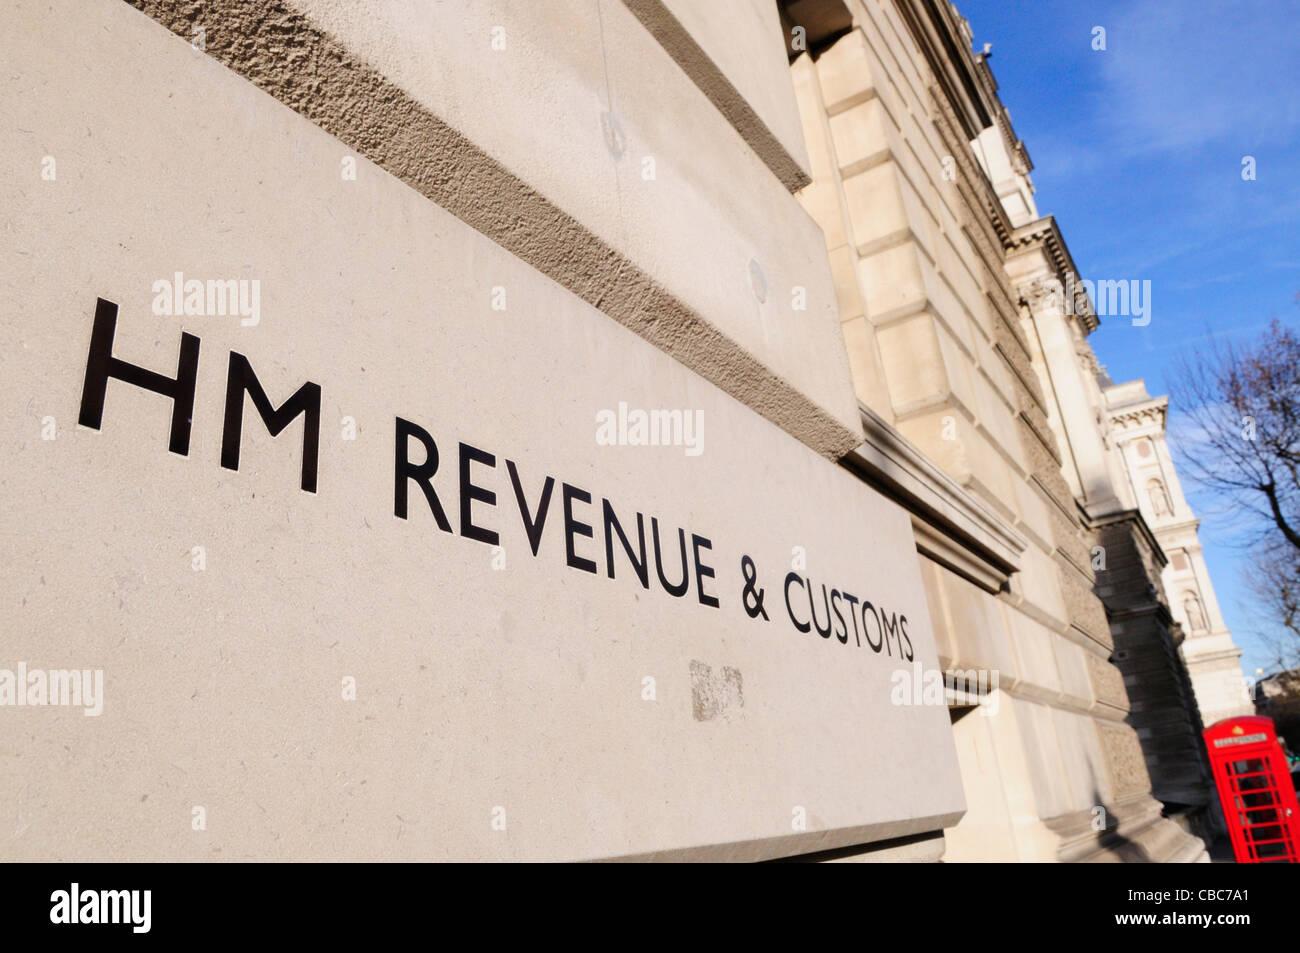 HM Revenue and Customs, Whitehall, London, England, UK - Stock Image